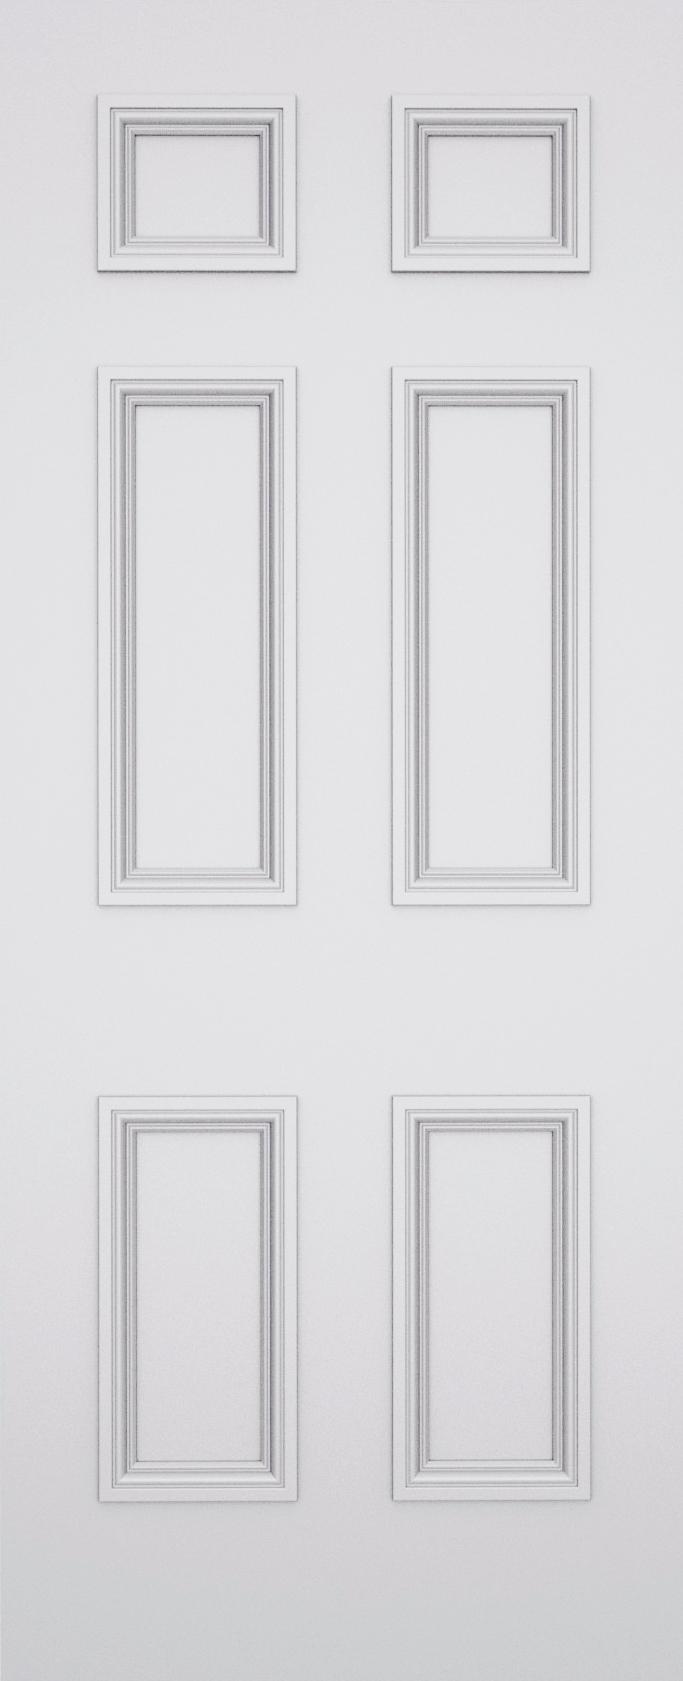 Sestina Balmoral 6 Panel Fire Door